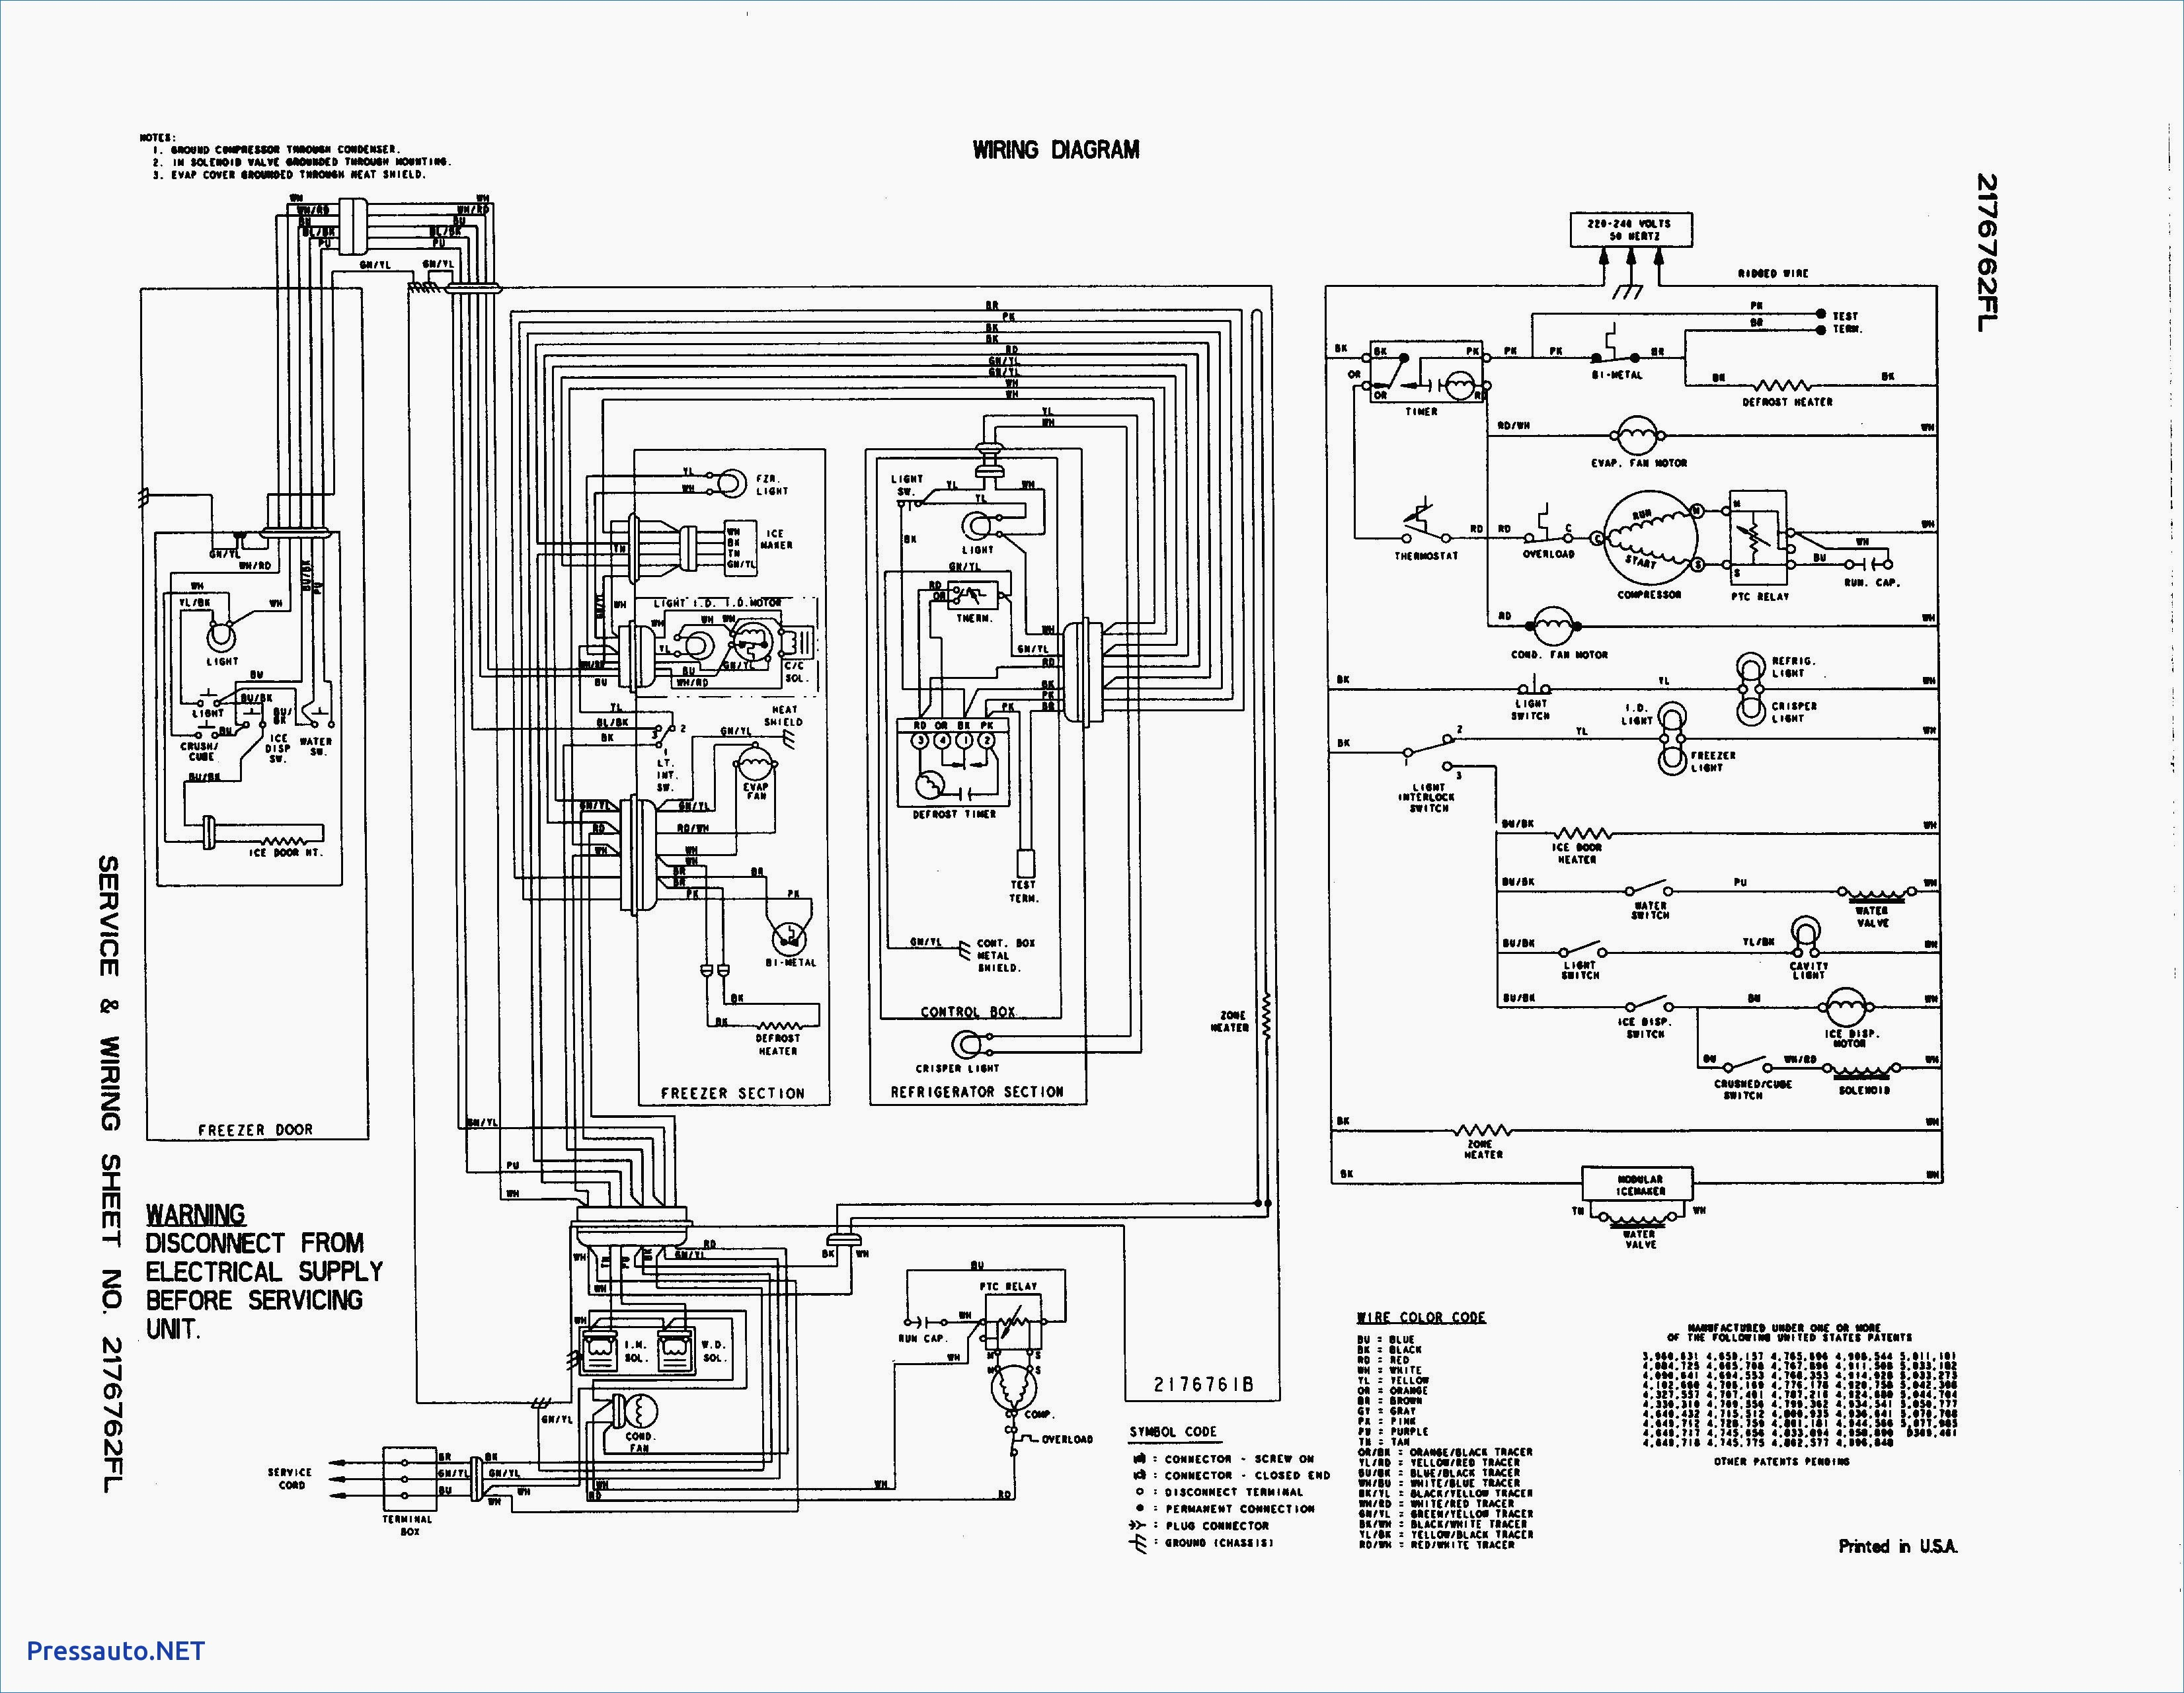 whirlpool dryer heating element diagram luxury wiring diagram for Smart Car Diagrams Friendship Bracelet Diagrams whirlpool